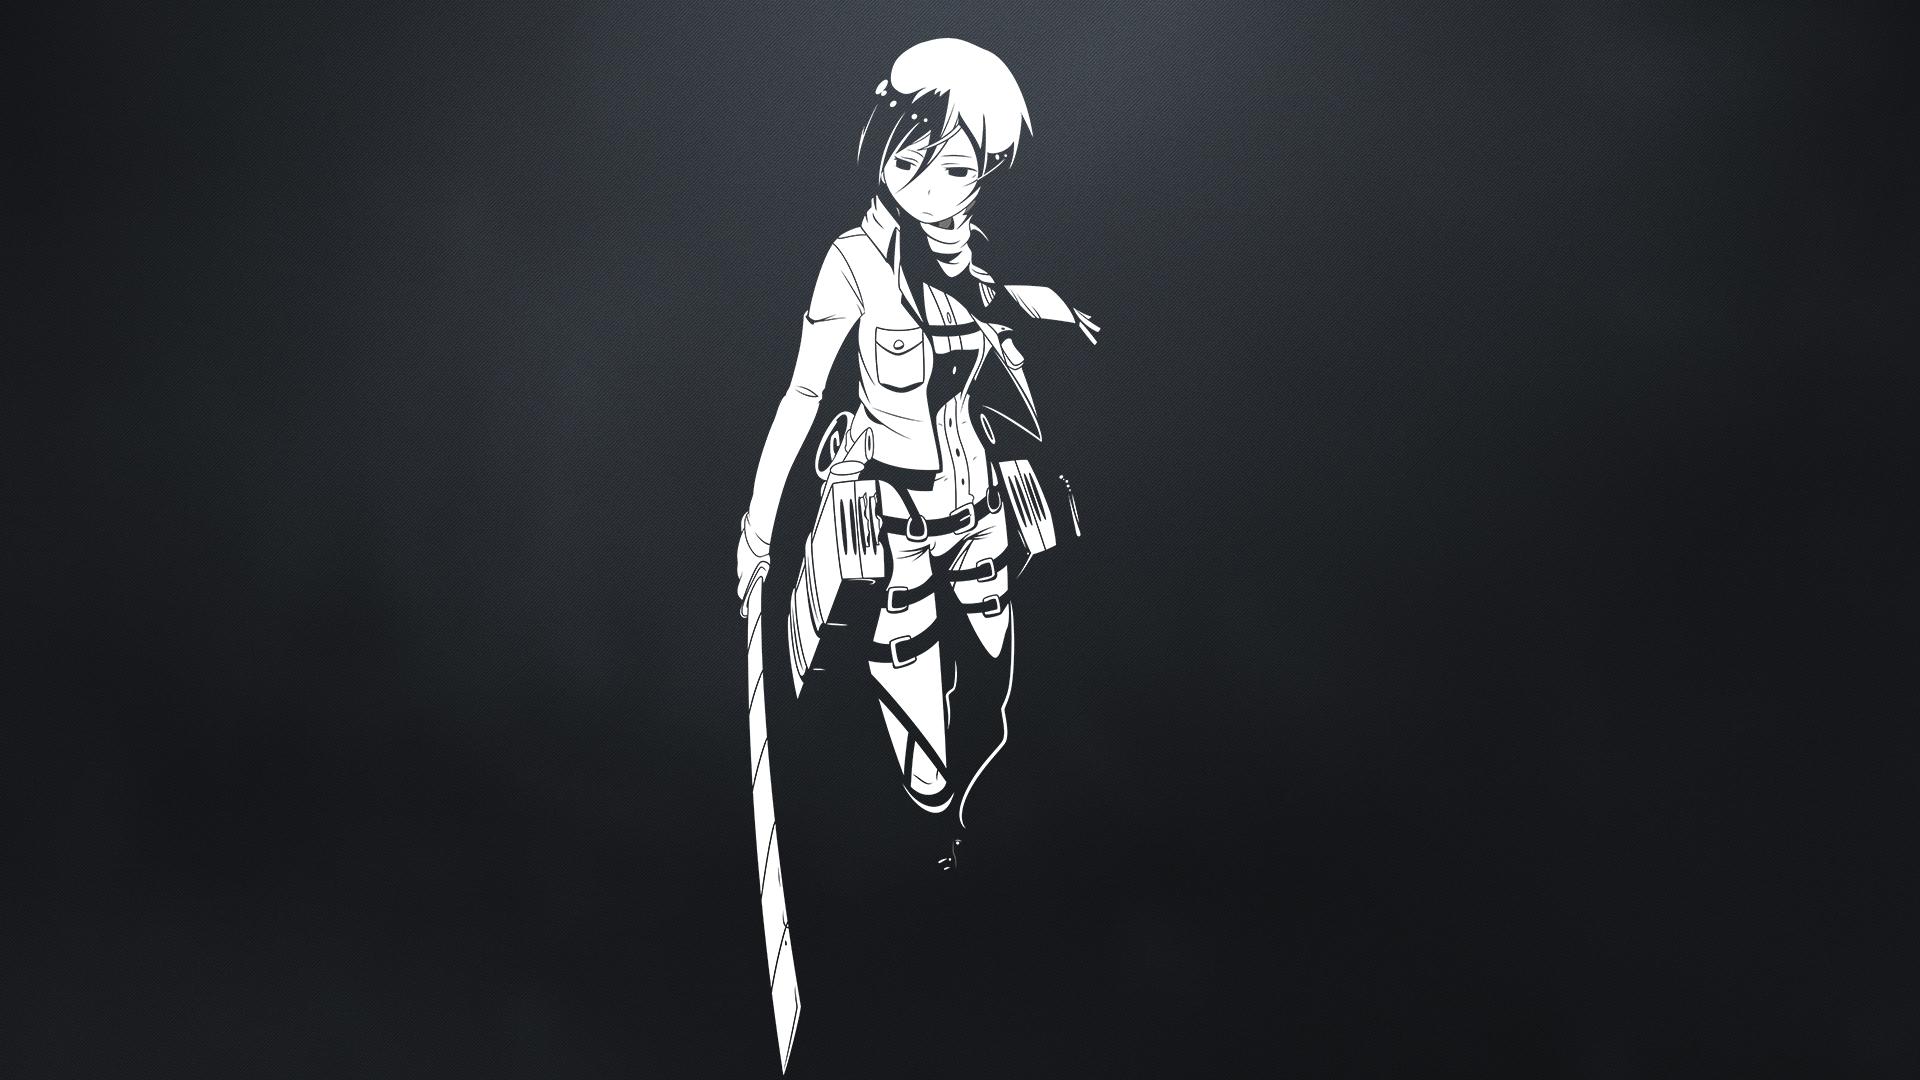 Wallpaper Shingeki No Kyojin Mikasa Ackerman Anime Girls 1920x1080 Mm88 1380019 Hd Wallpapers Wallhere